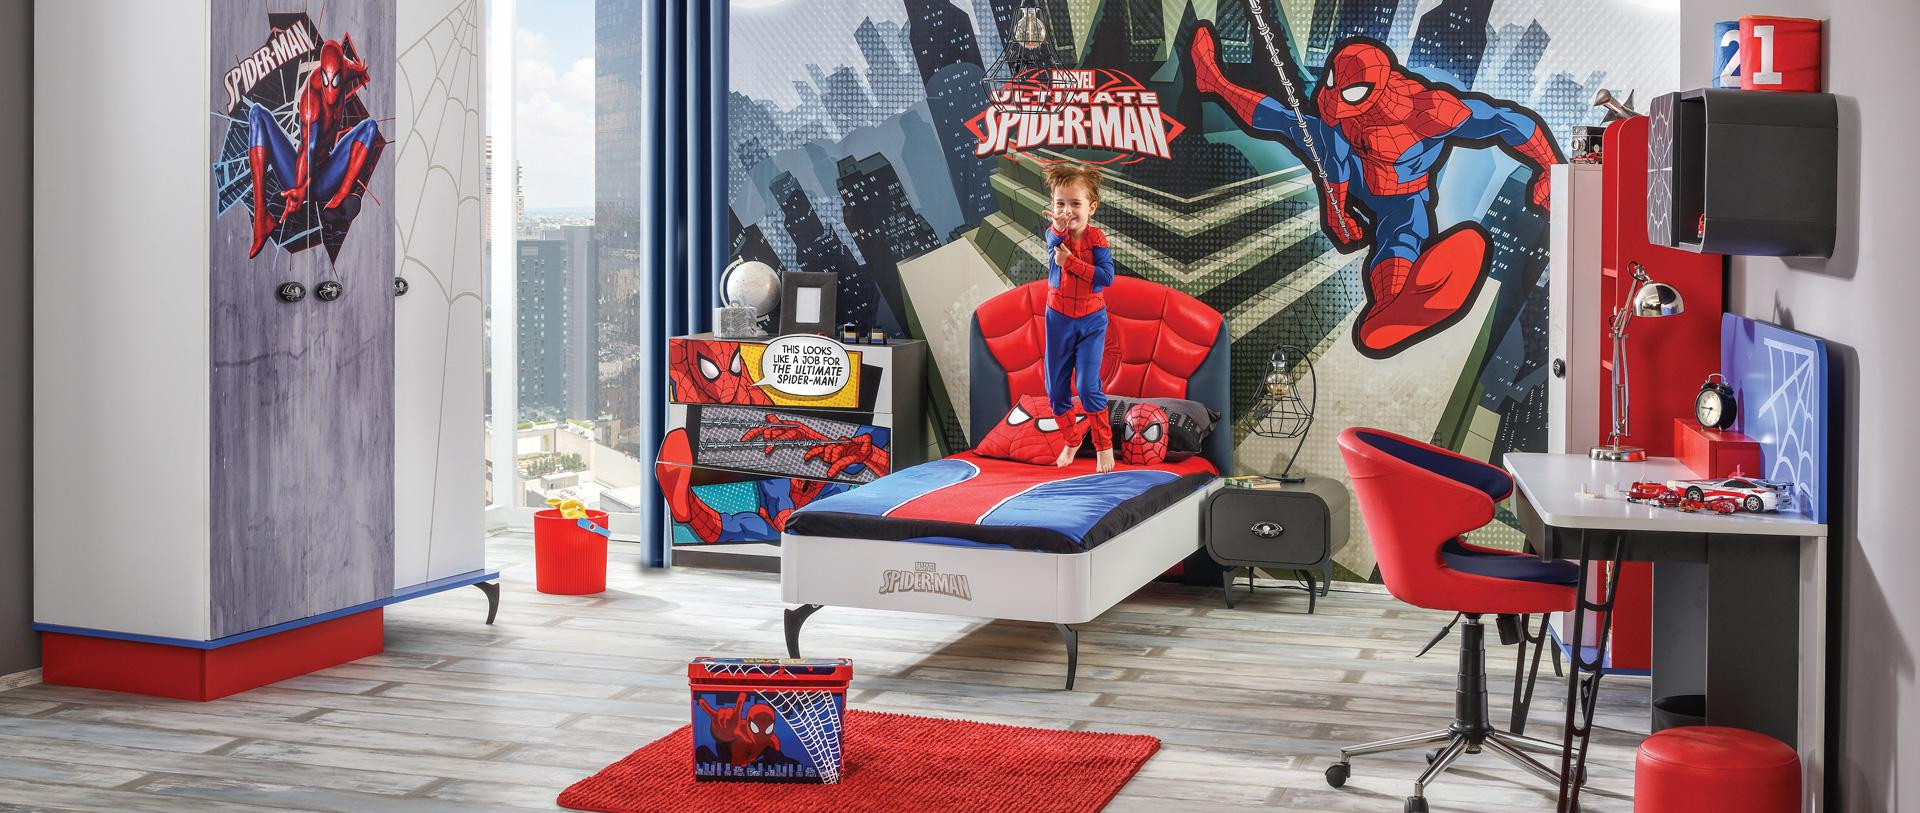 ALFEMO KIDS&TEENS DISNEY SPIDERMAN YOUNG ROOM